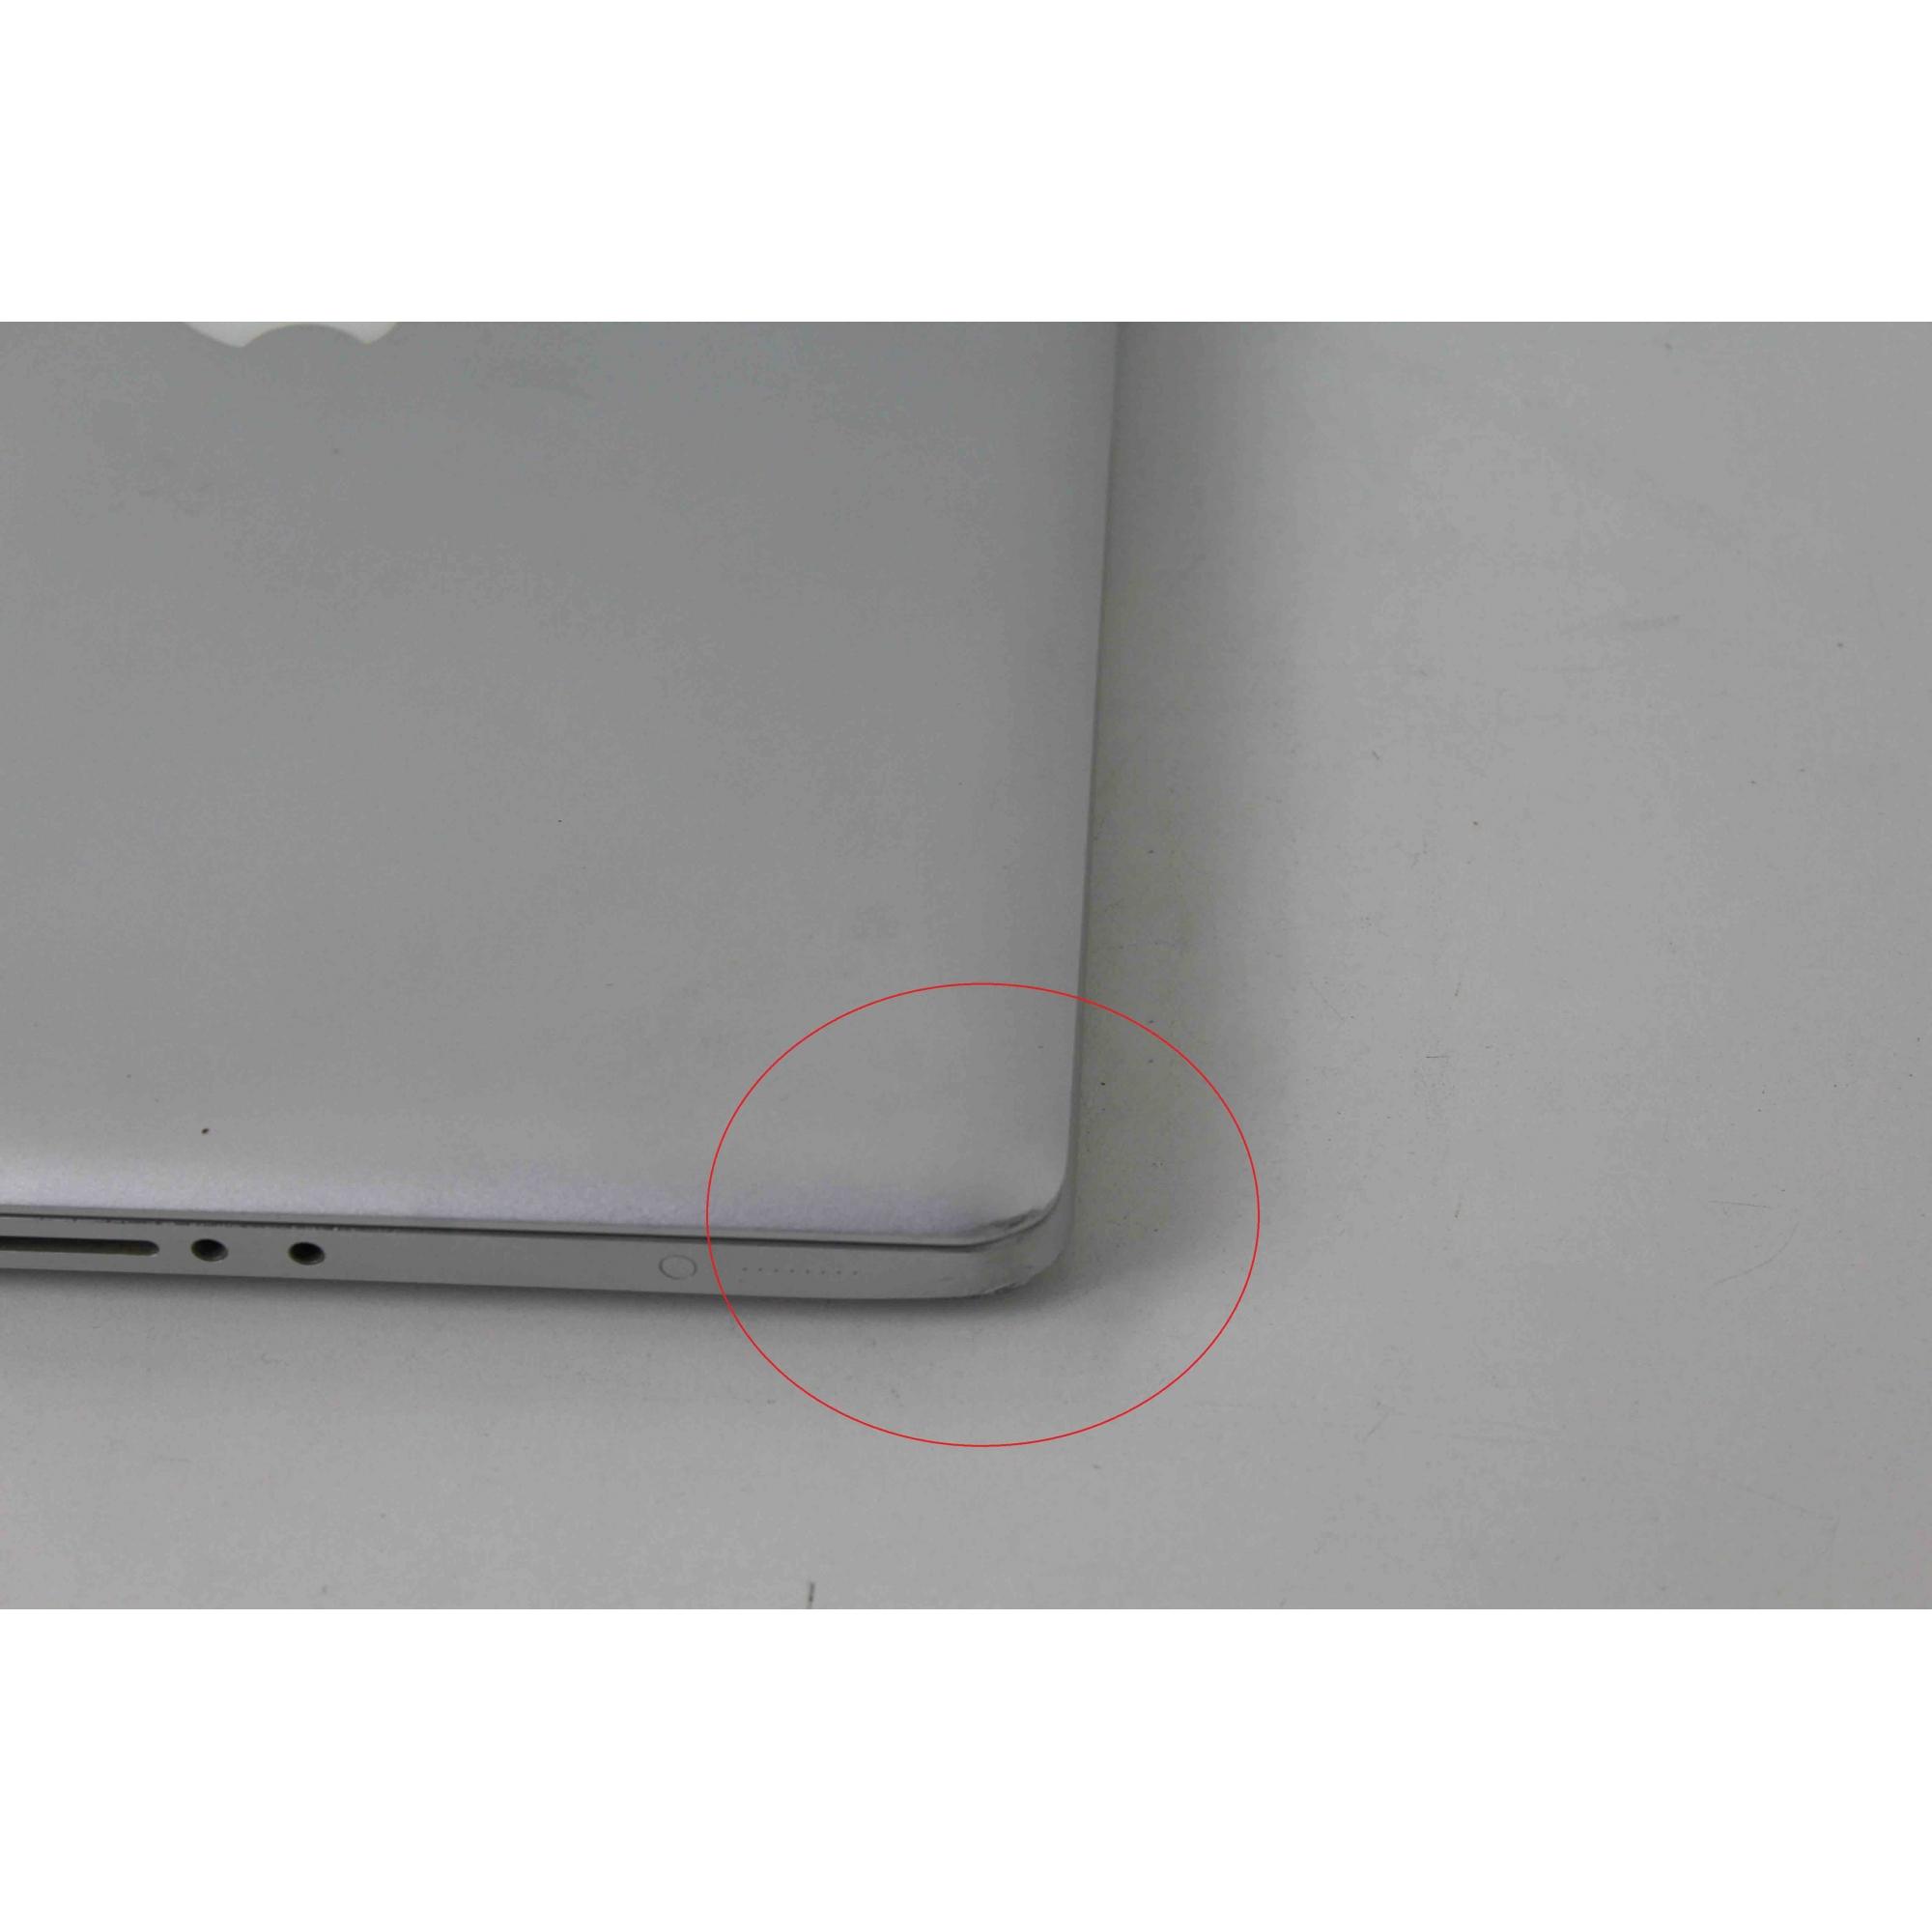 "Macbook Pro MC373LL/A 15.4"" Intel Core i7 2.66GHz 8GB HD-500GB + SSD-240GB Não enviamos"